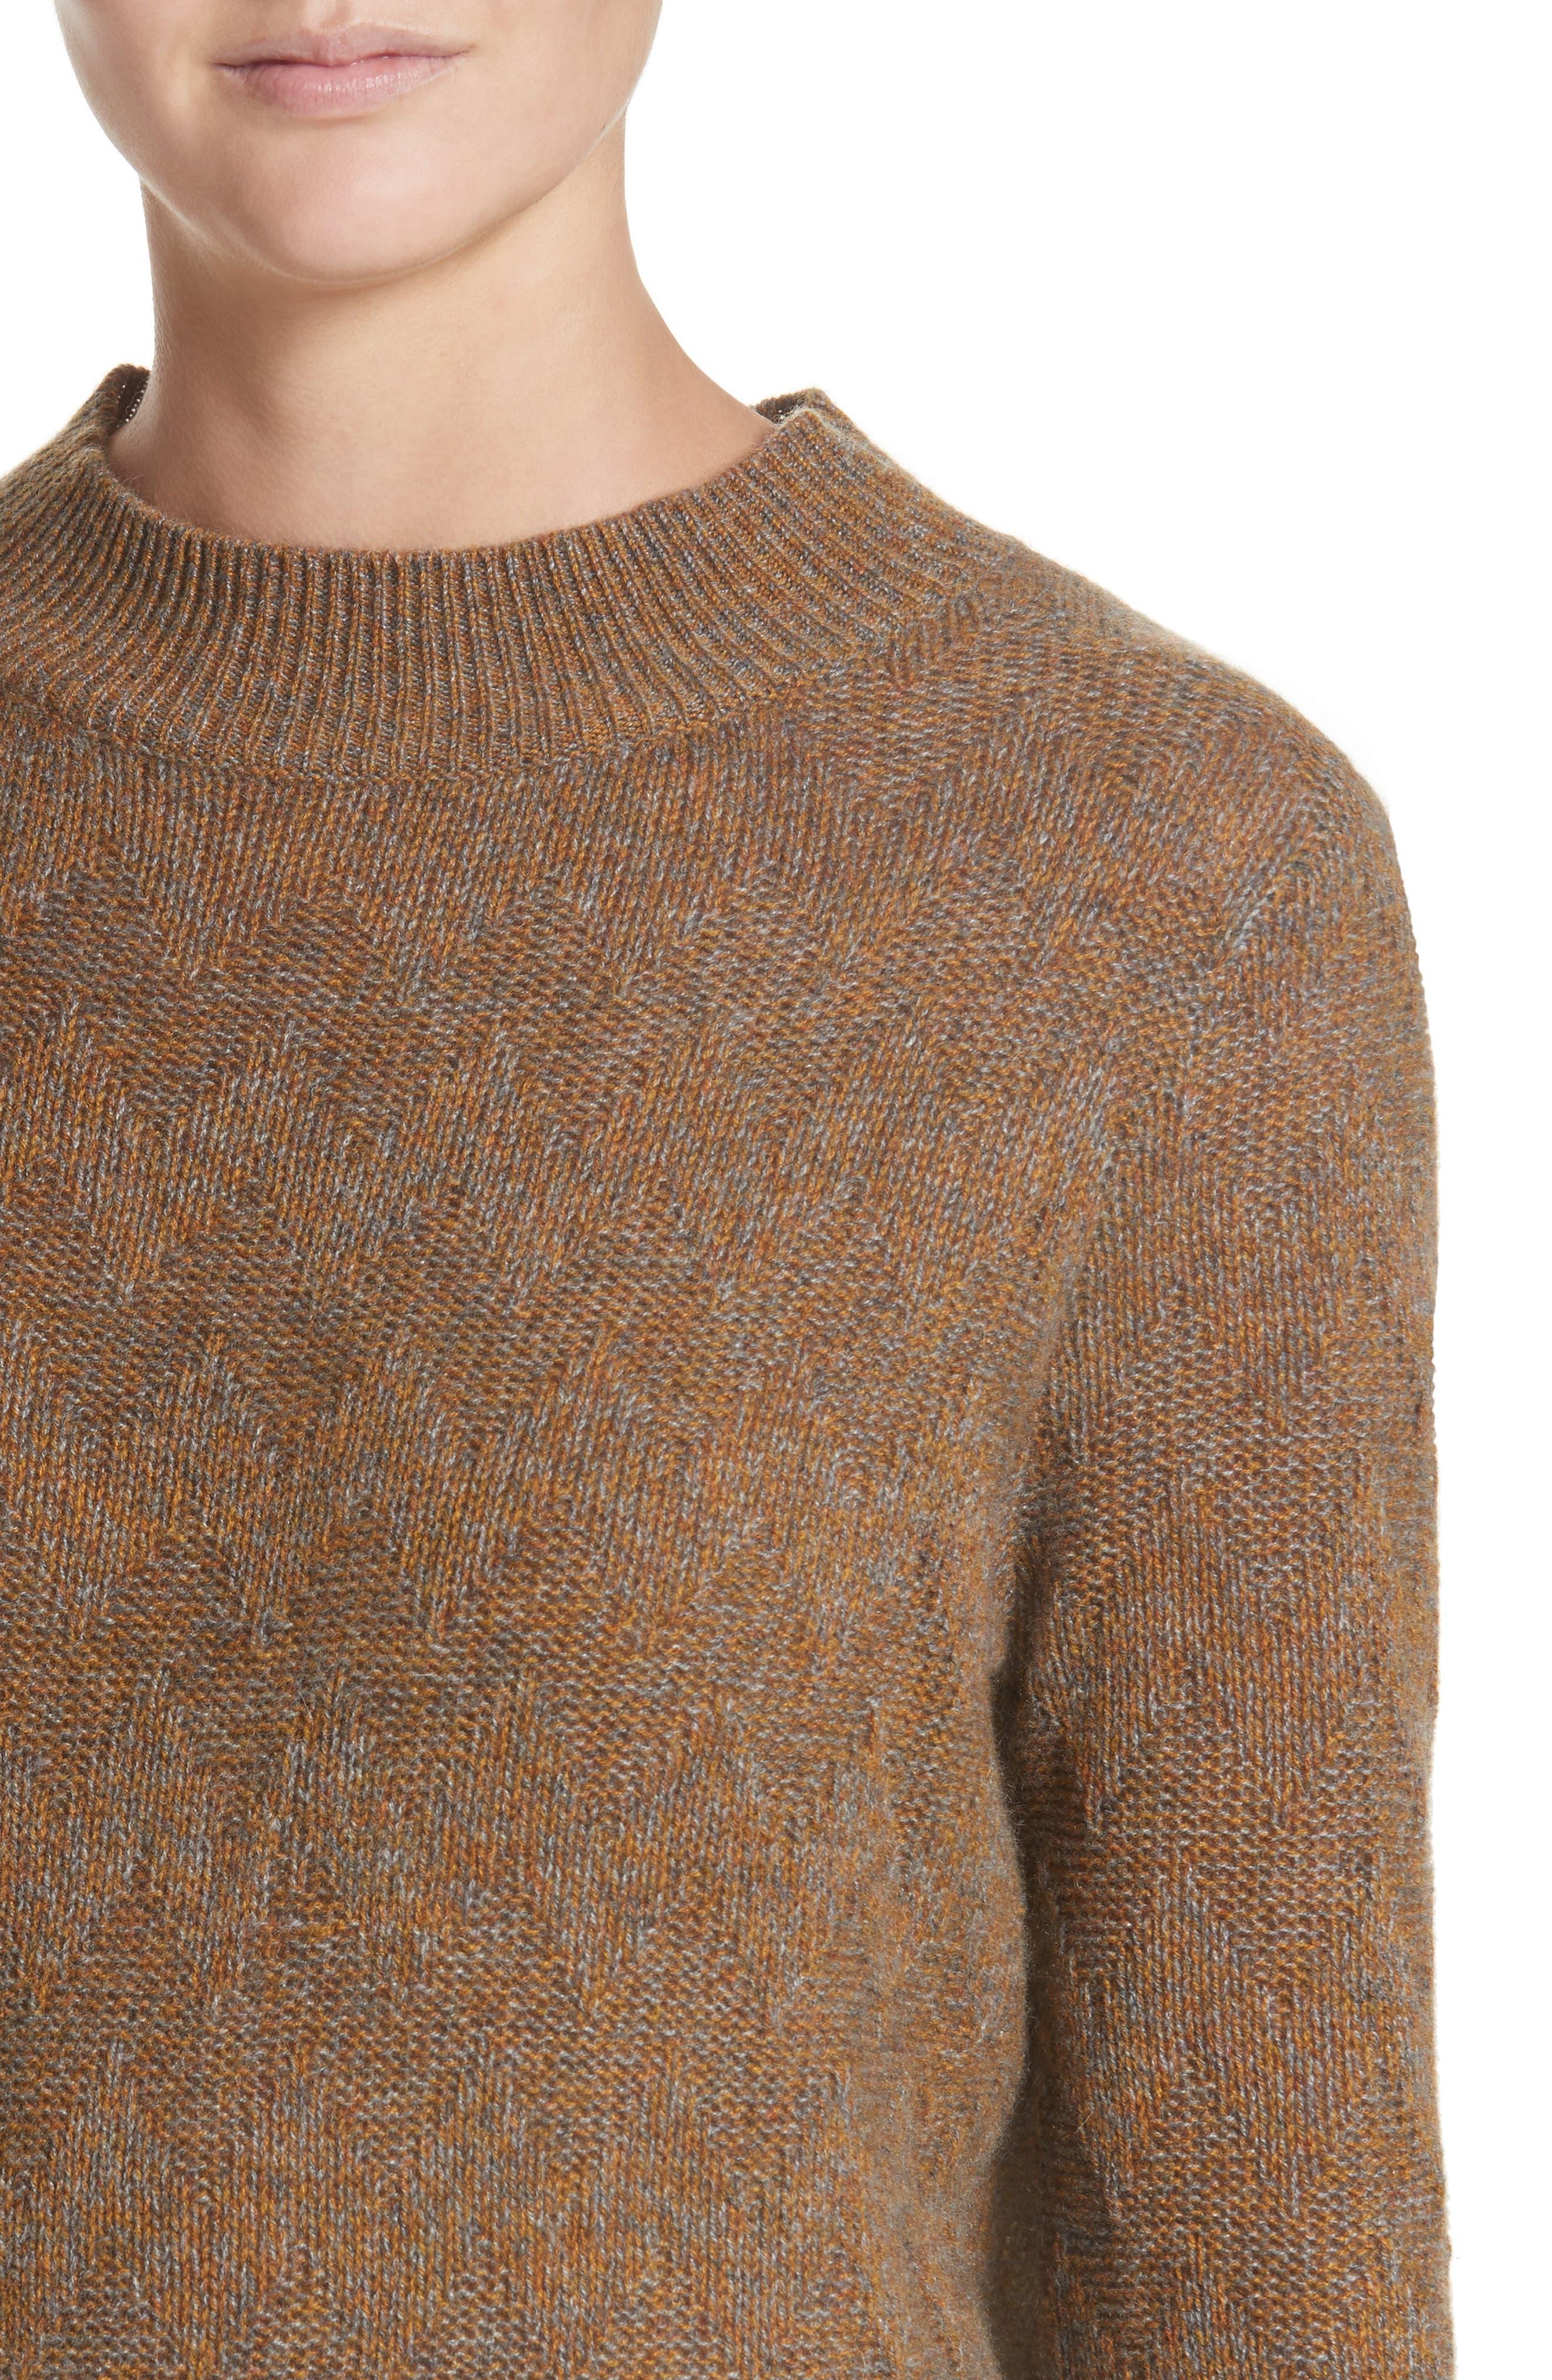 Chevron Knit Cashmere Sweater,                             Alternate thumbnail 4, color,                             Brown